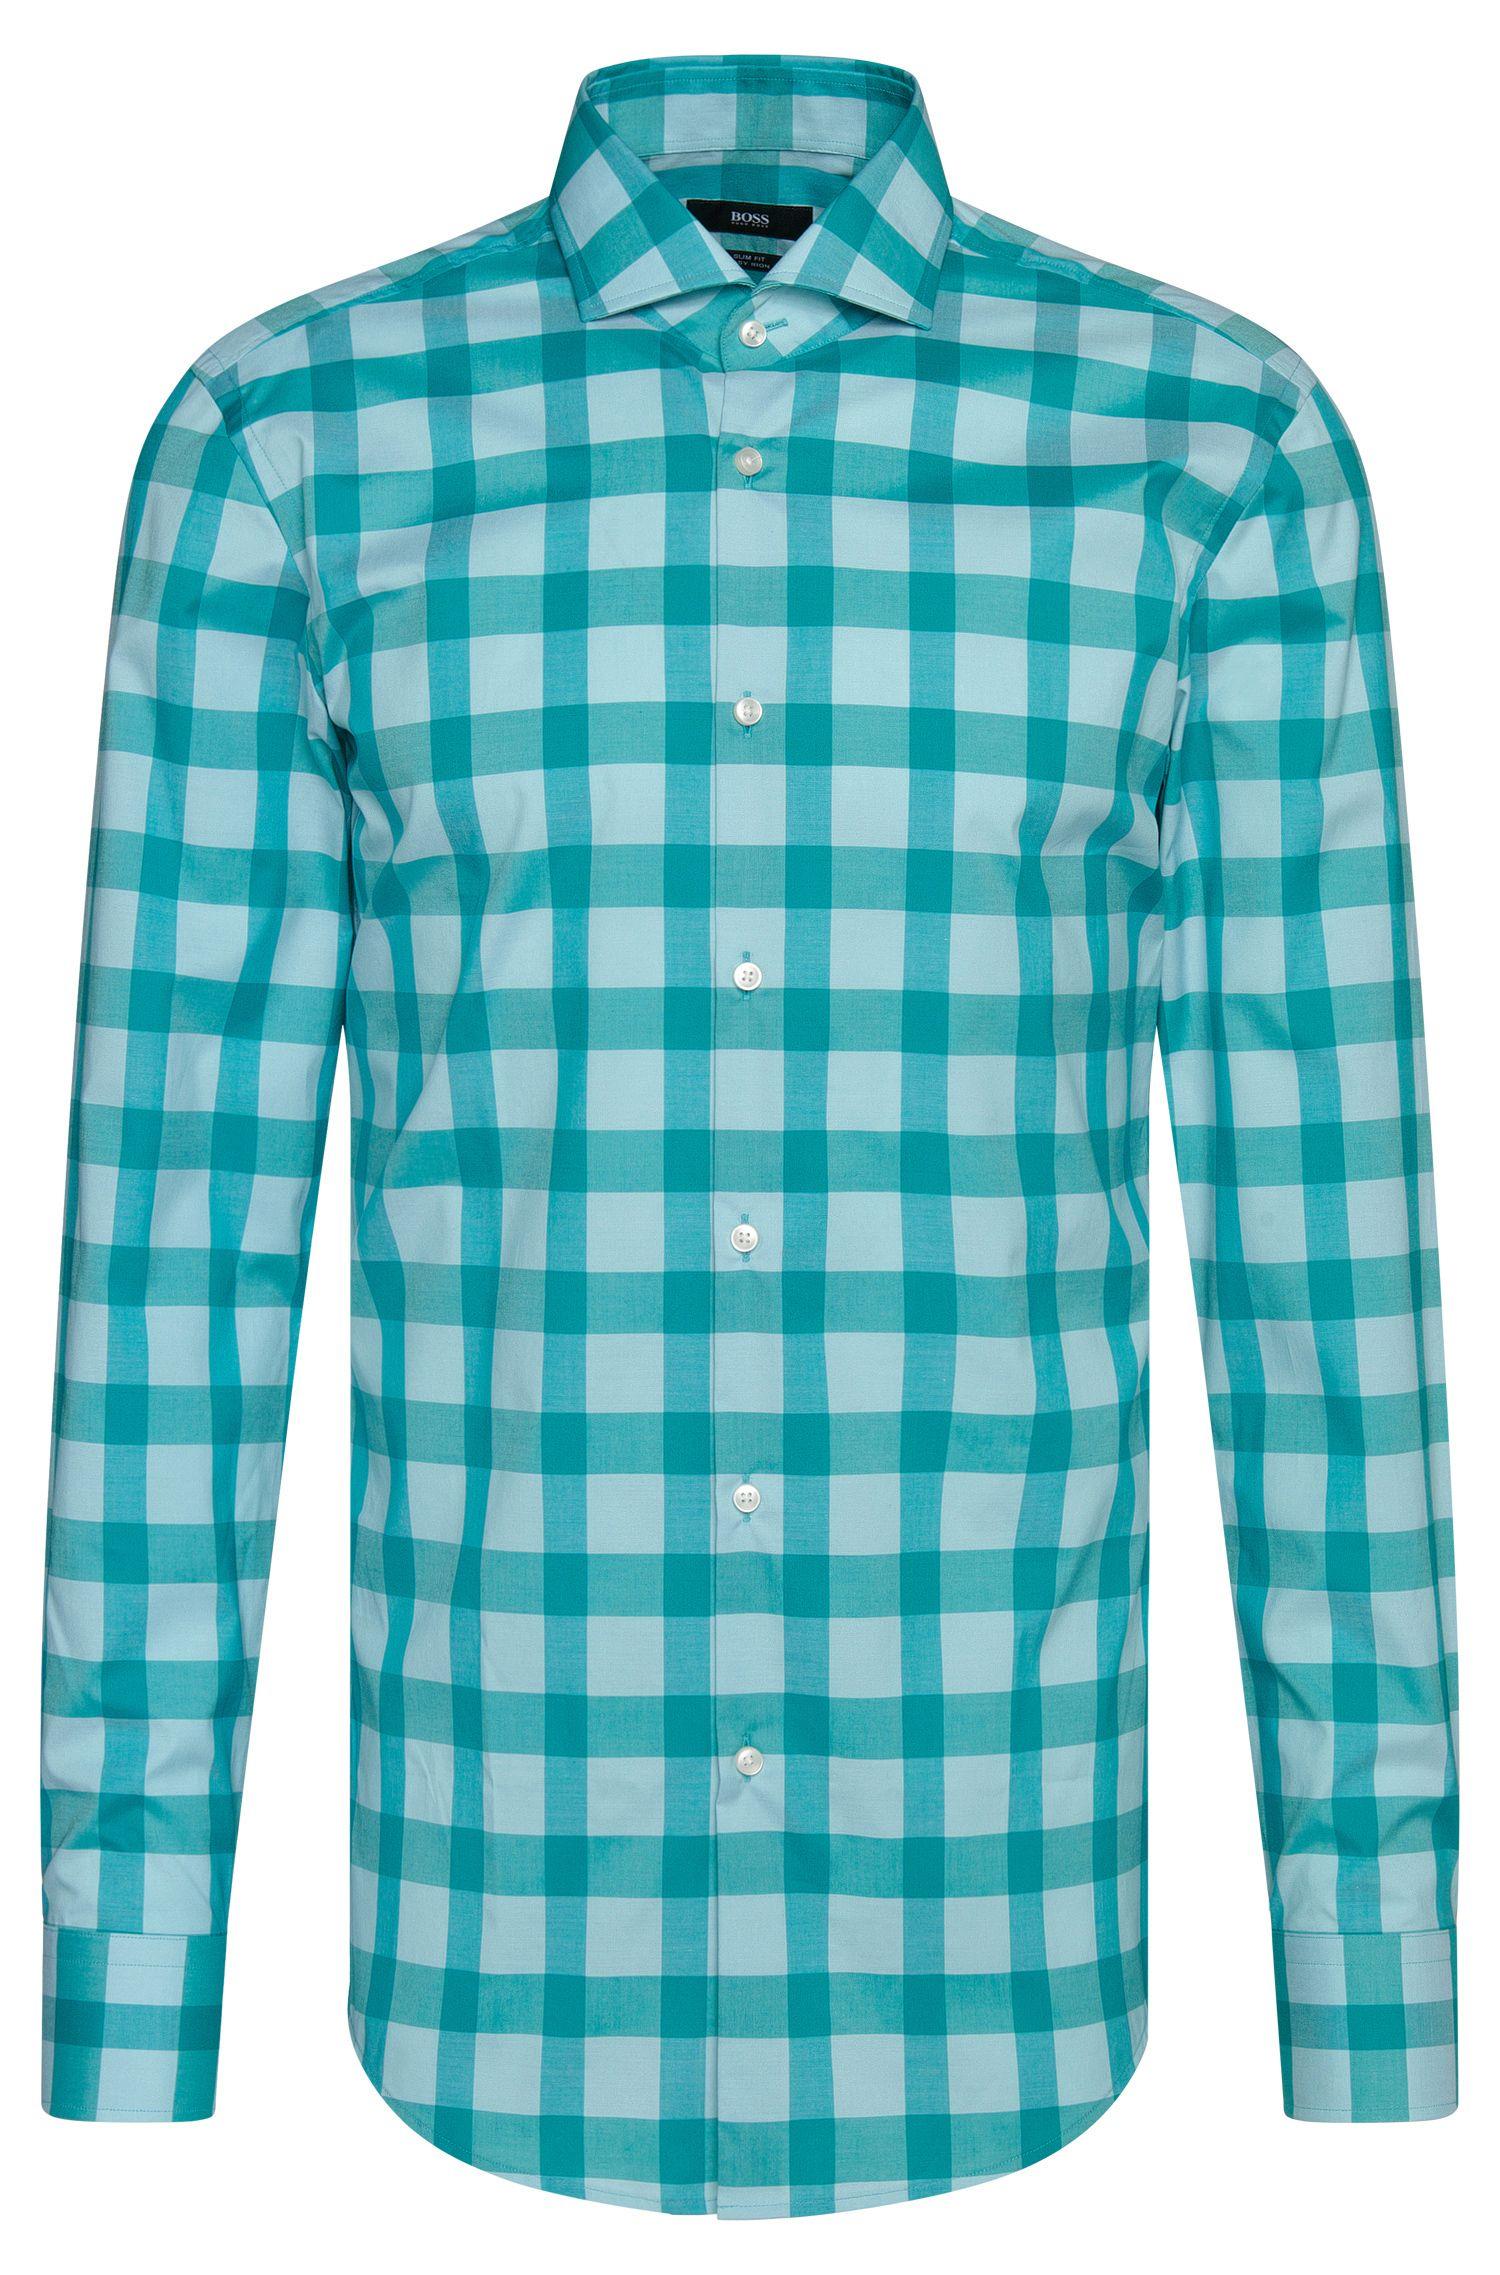 Buffalo Check Cotton Easy Iron Dress Shirt, Slim Fit   Jason